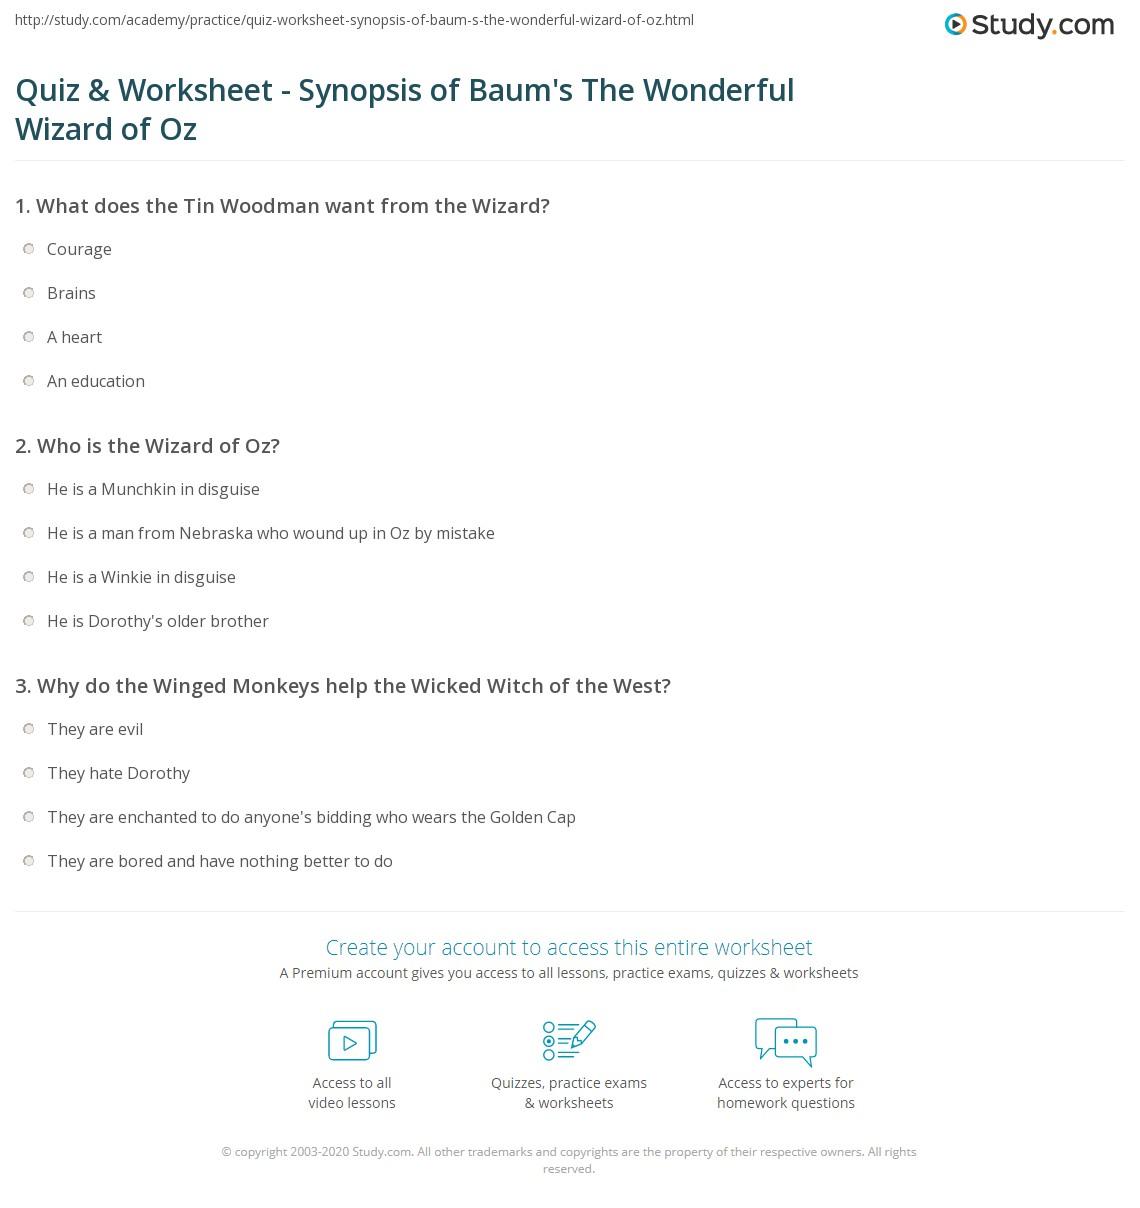 Quiz Worksheet Synopsis of Baums The Wonderful Wizard of Oz – Math Wizard Worksheet